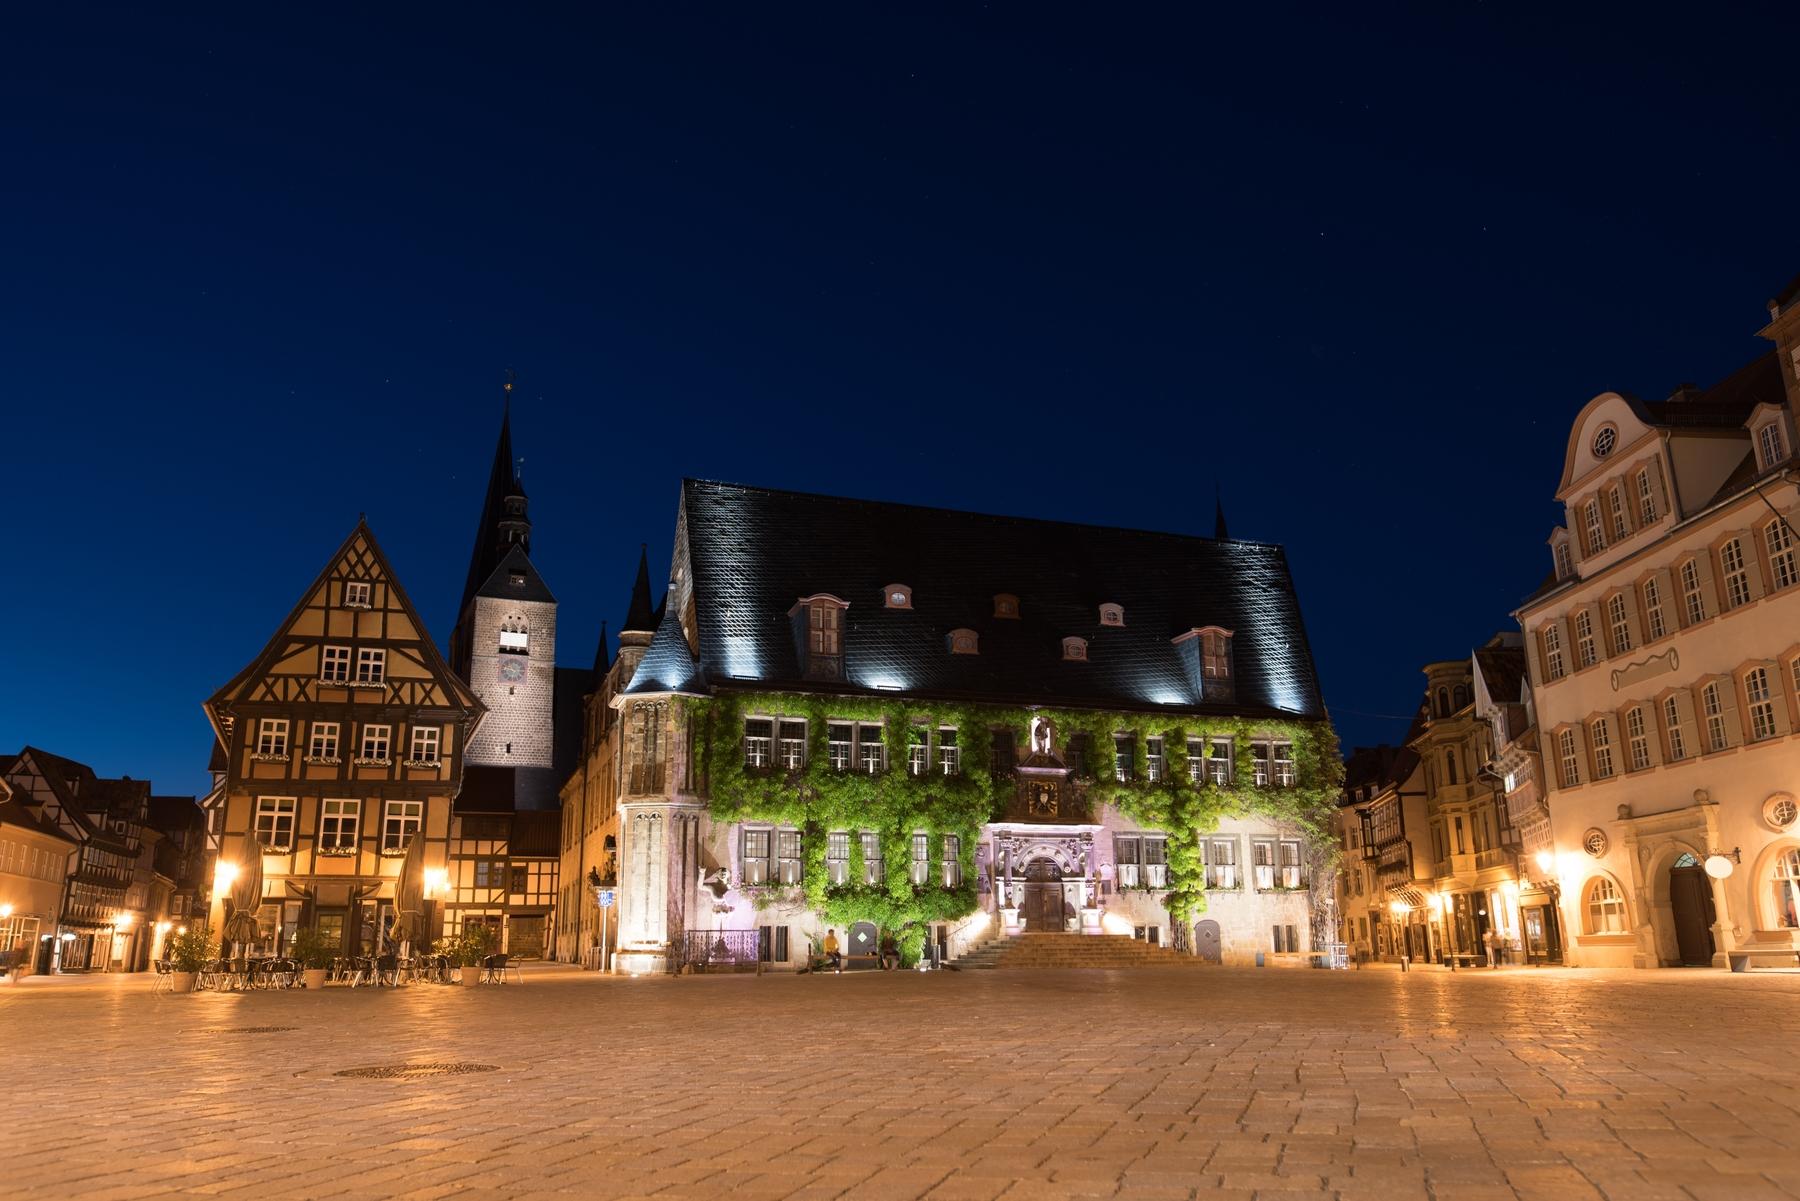 Немецкий город Кведлинбург